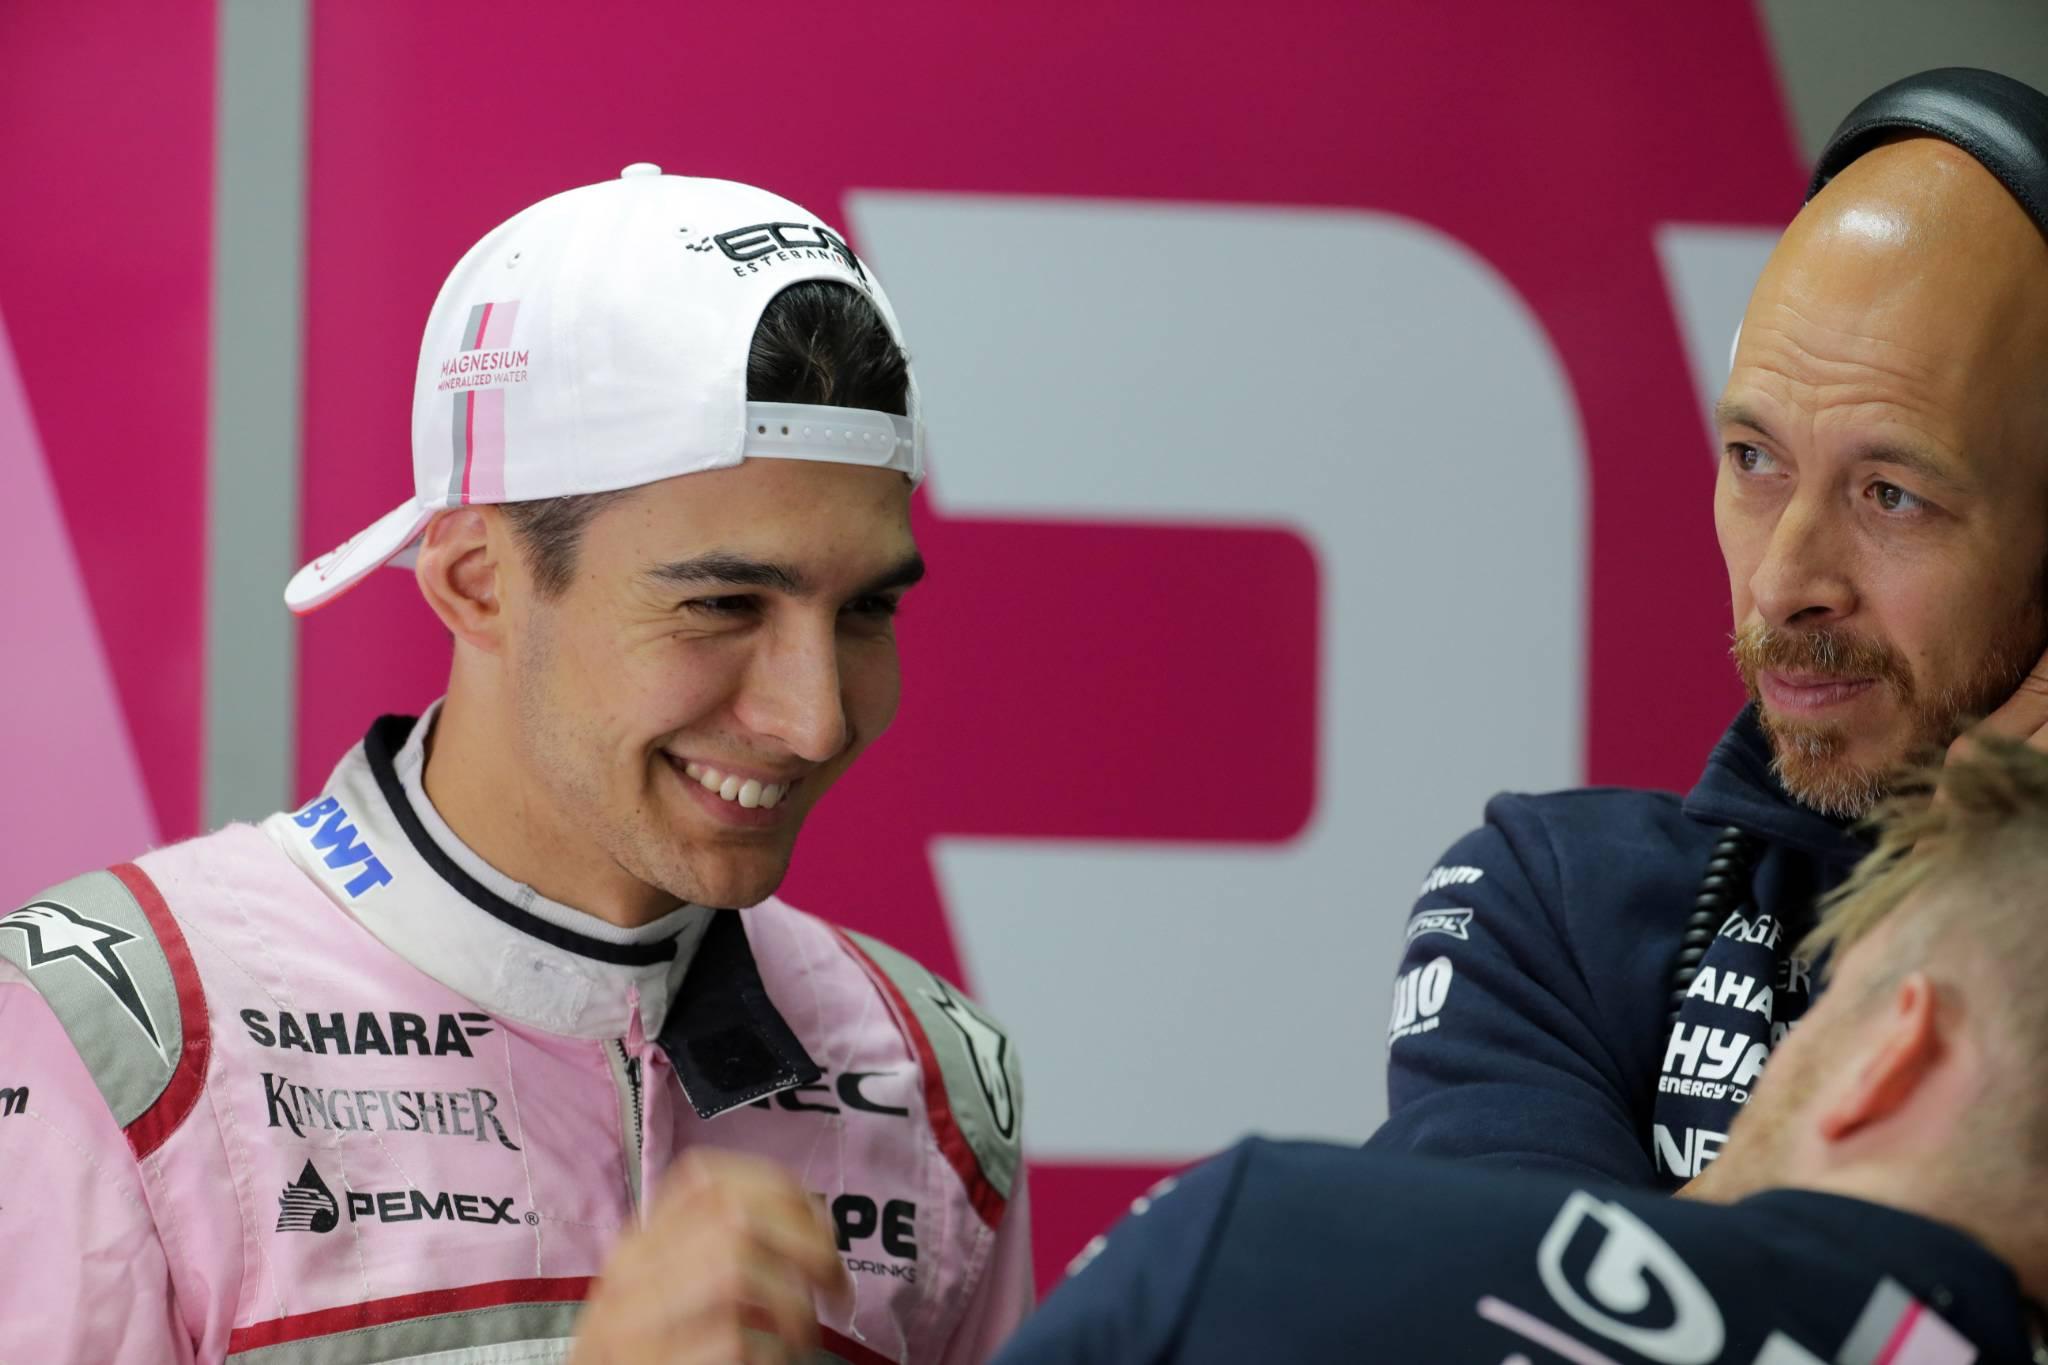 21.07.2018 - Free Practice 2, Esteban Ocon (FRA) Sahara Force India F1 VJM11